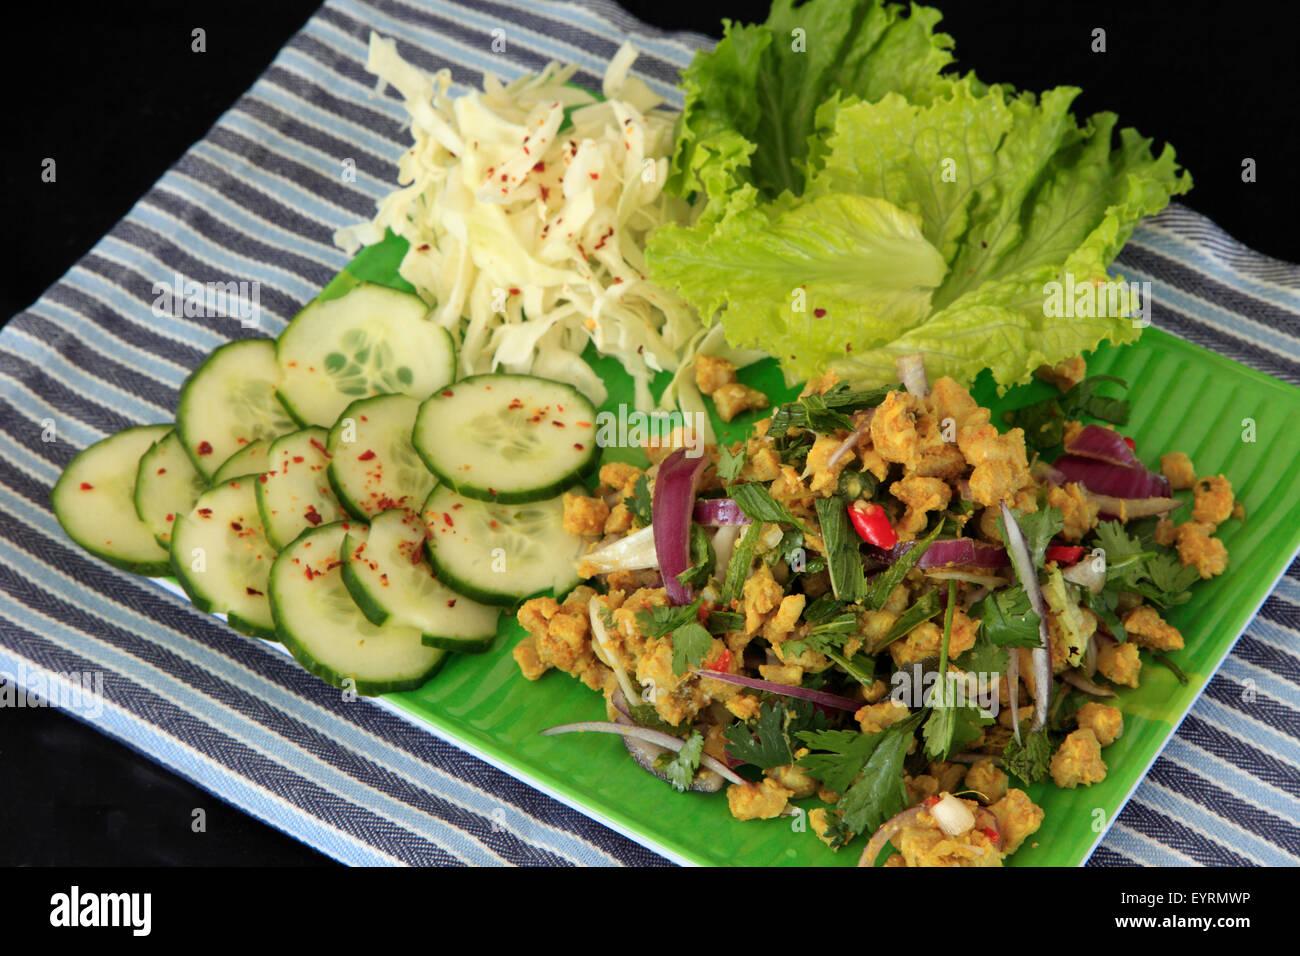 Laotian food, fish larb, - Stock Image